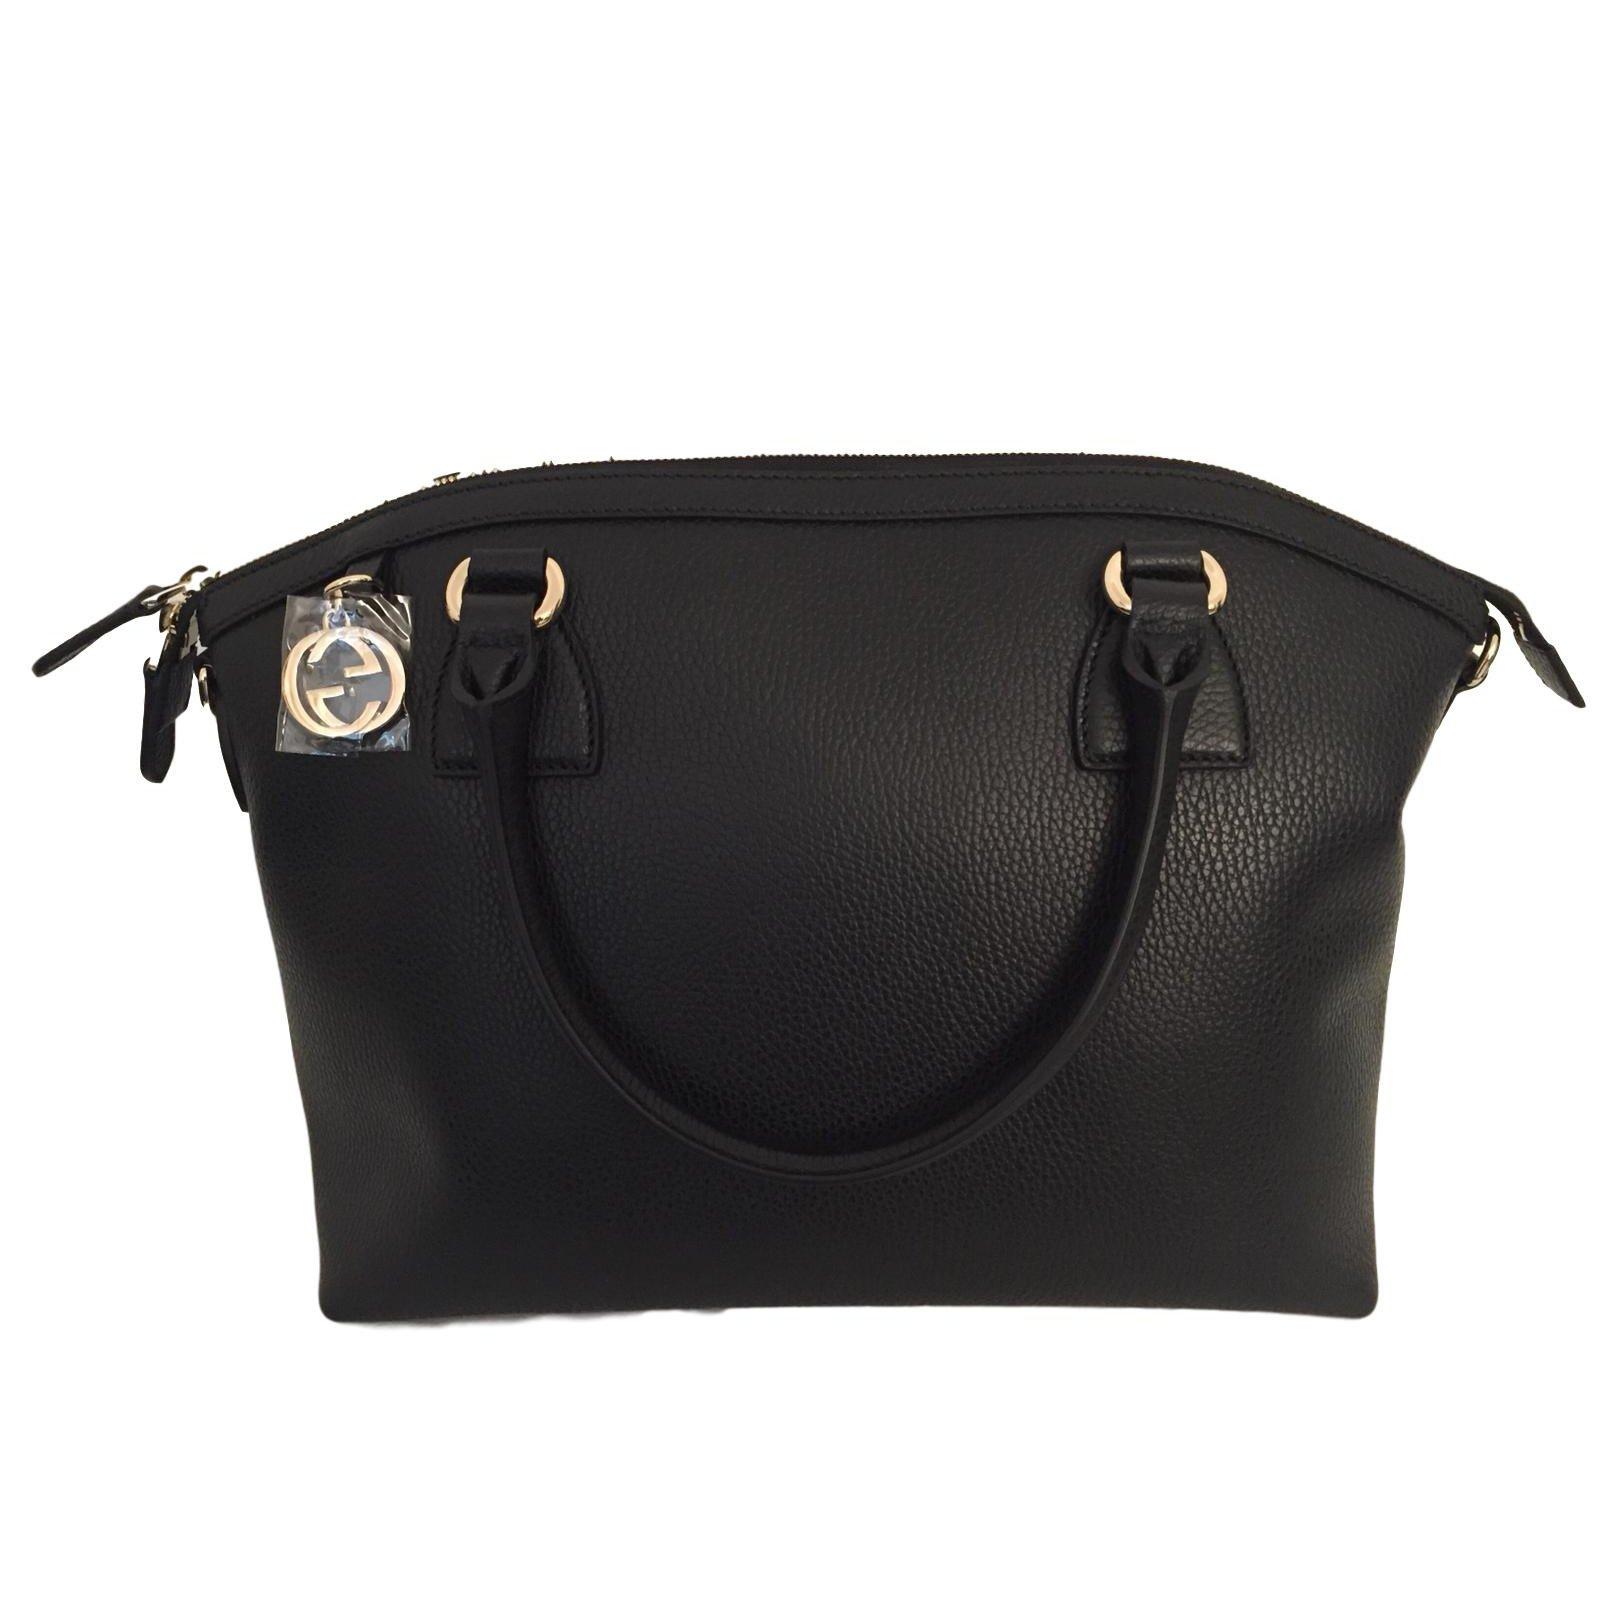 6128ec6924 Handbag